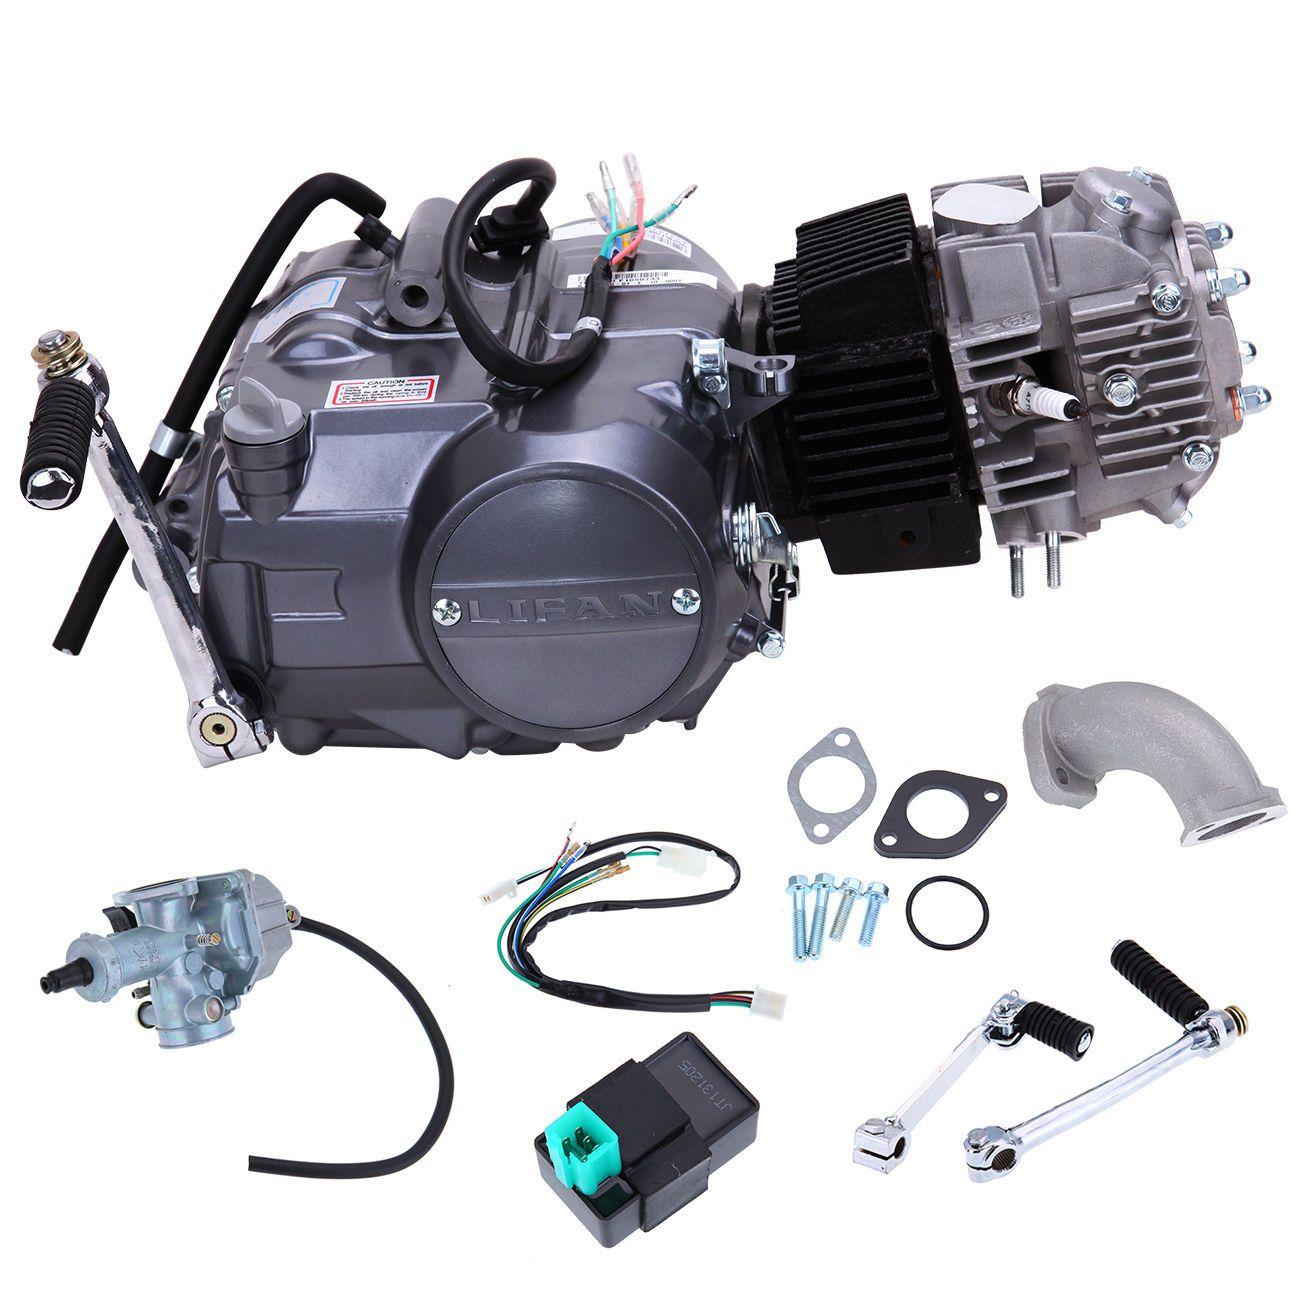 125cc 4 Stroke Single Cylinder Air Cooled Engine Motor For Honda Crf 50 70 Xr50 In Ebay Motors